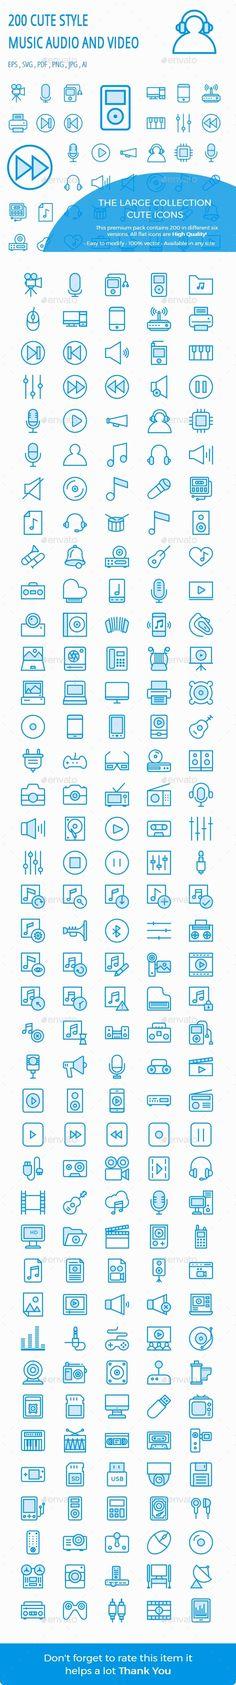 Music, Audio, Video Cute Style icon